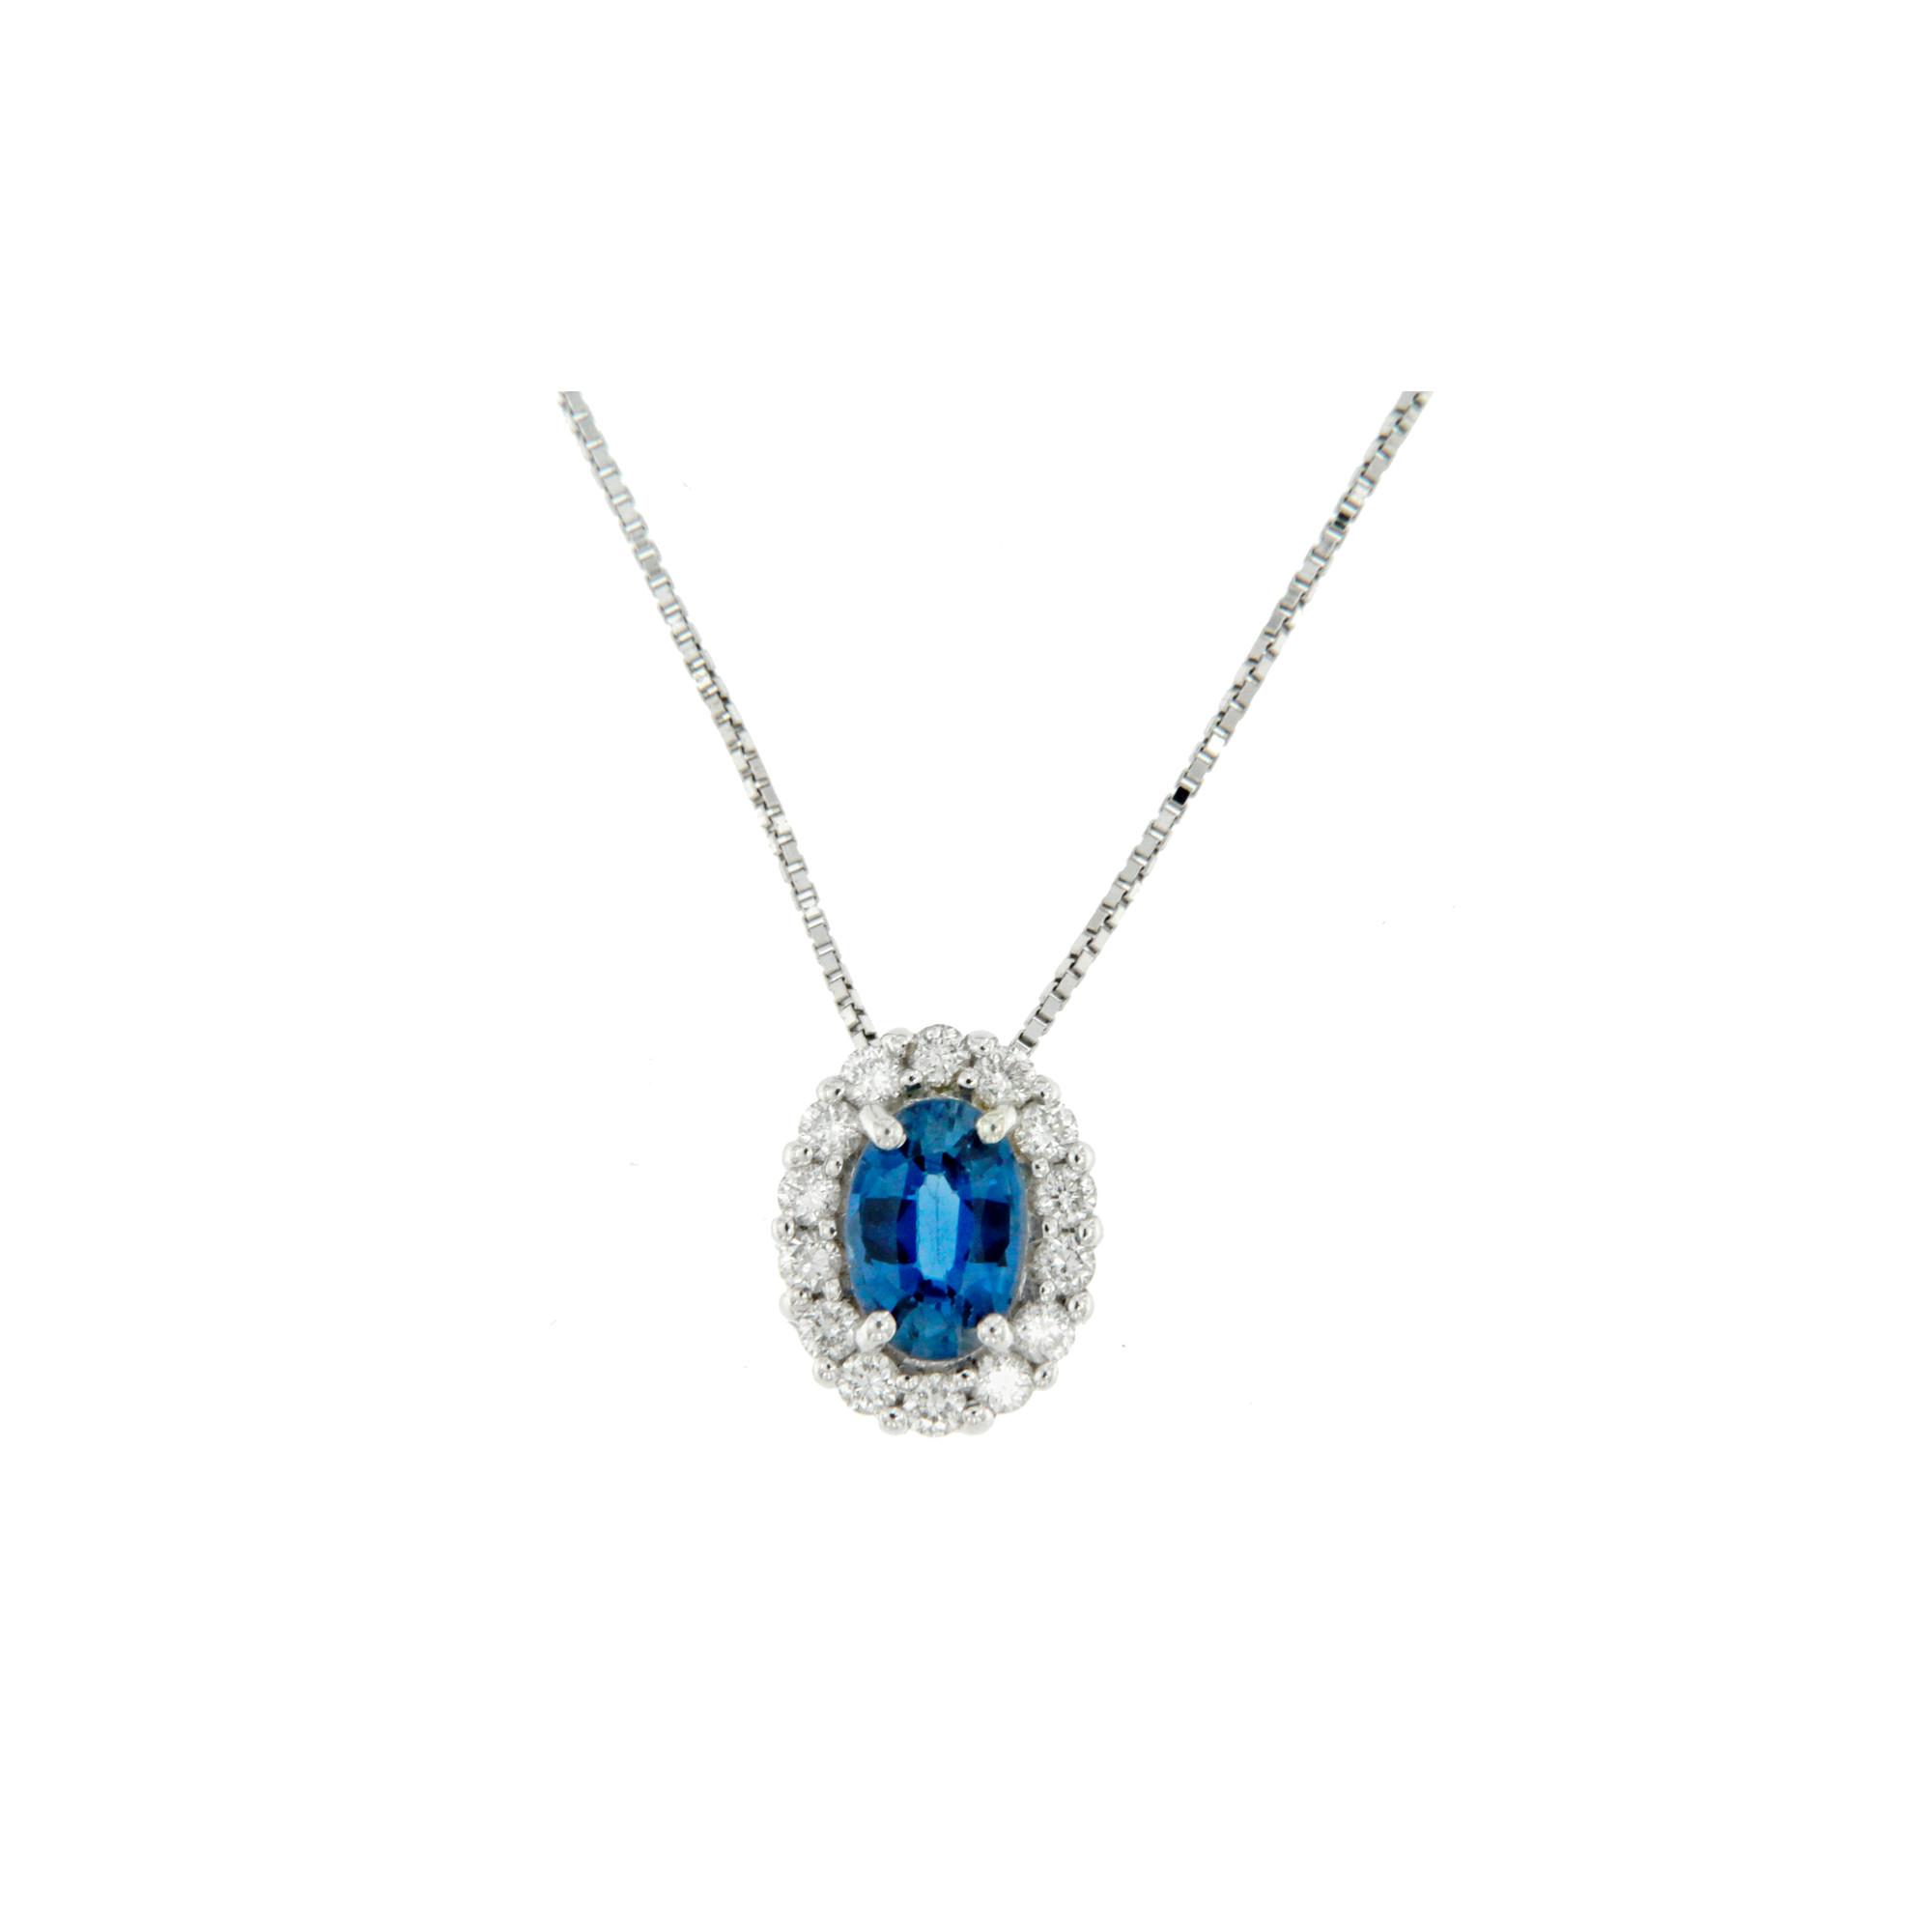 collana pendente zaffiro e diamanti diamonds sapphire necklace Bon Ton online P6421Z